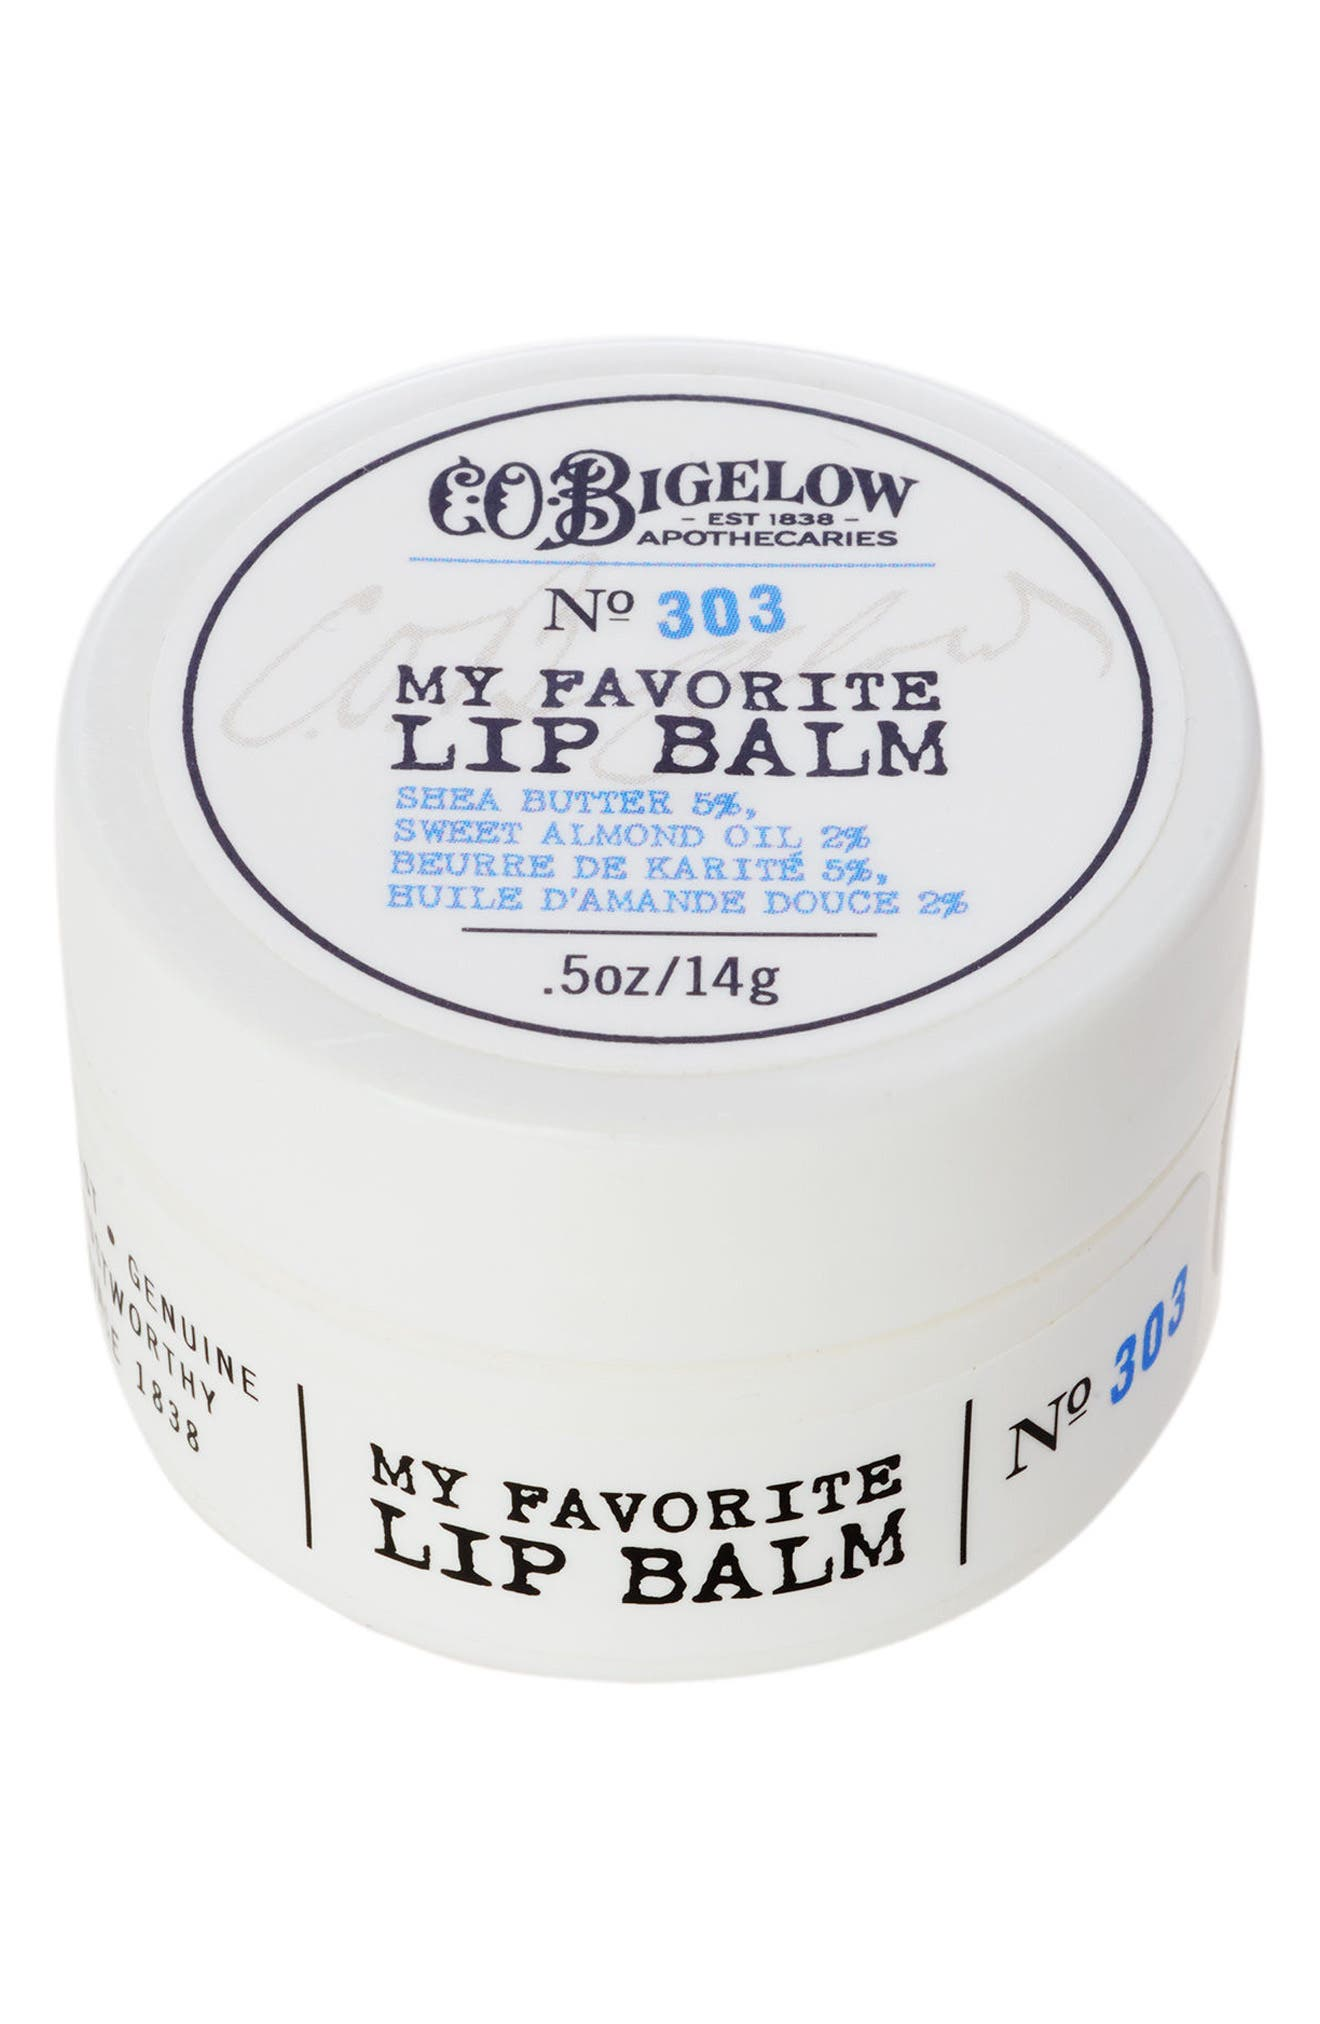 Main Image - C.O. Bigelow® No. 303 My Favorite Lip Balm in a Jar